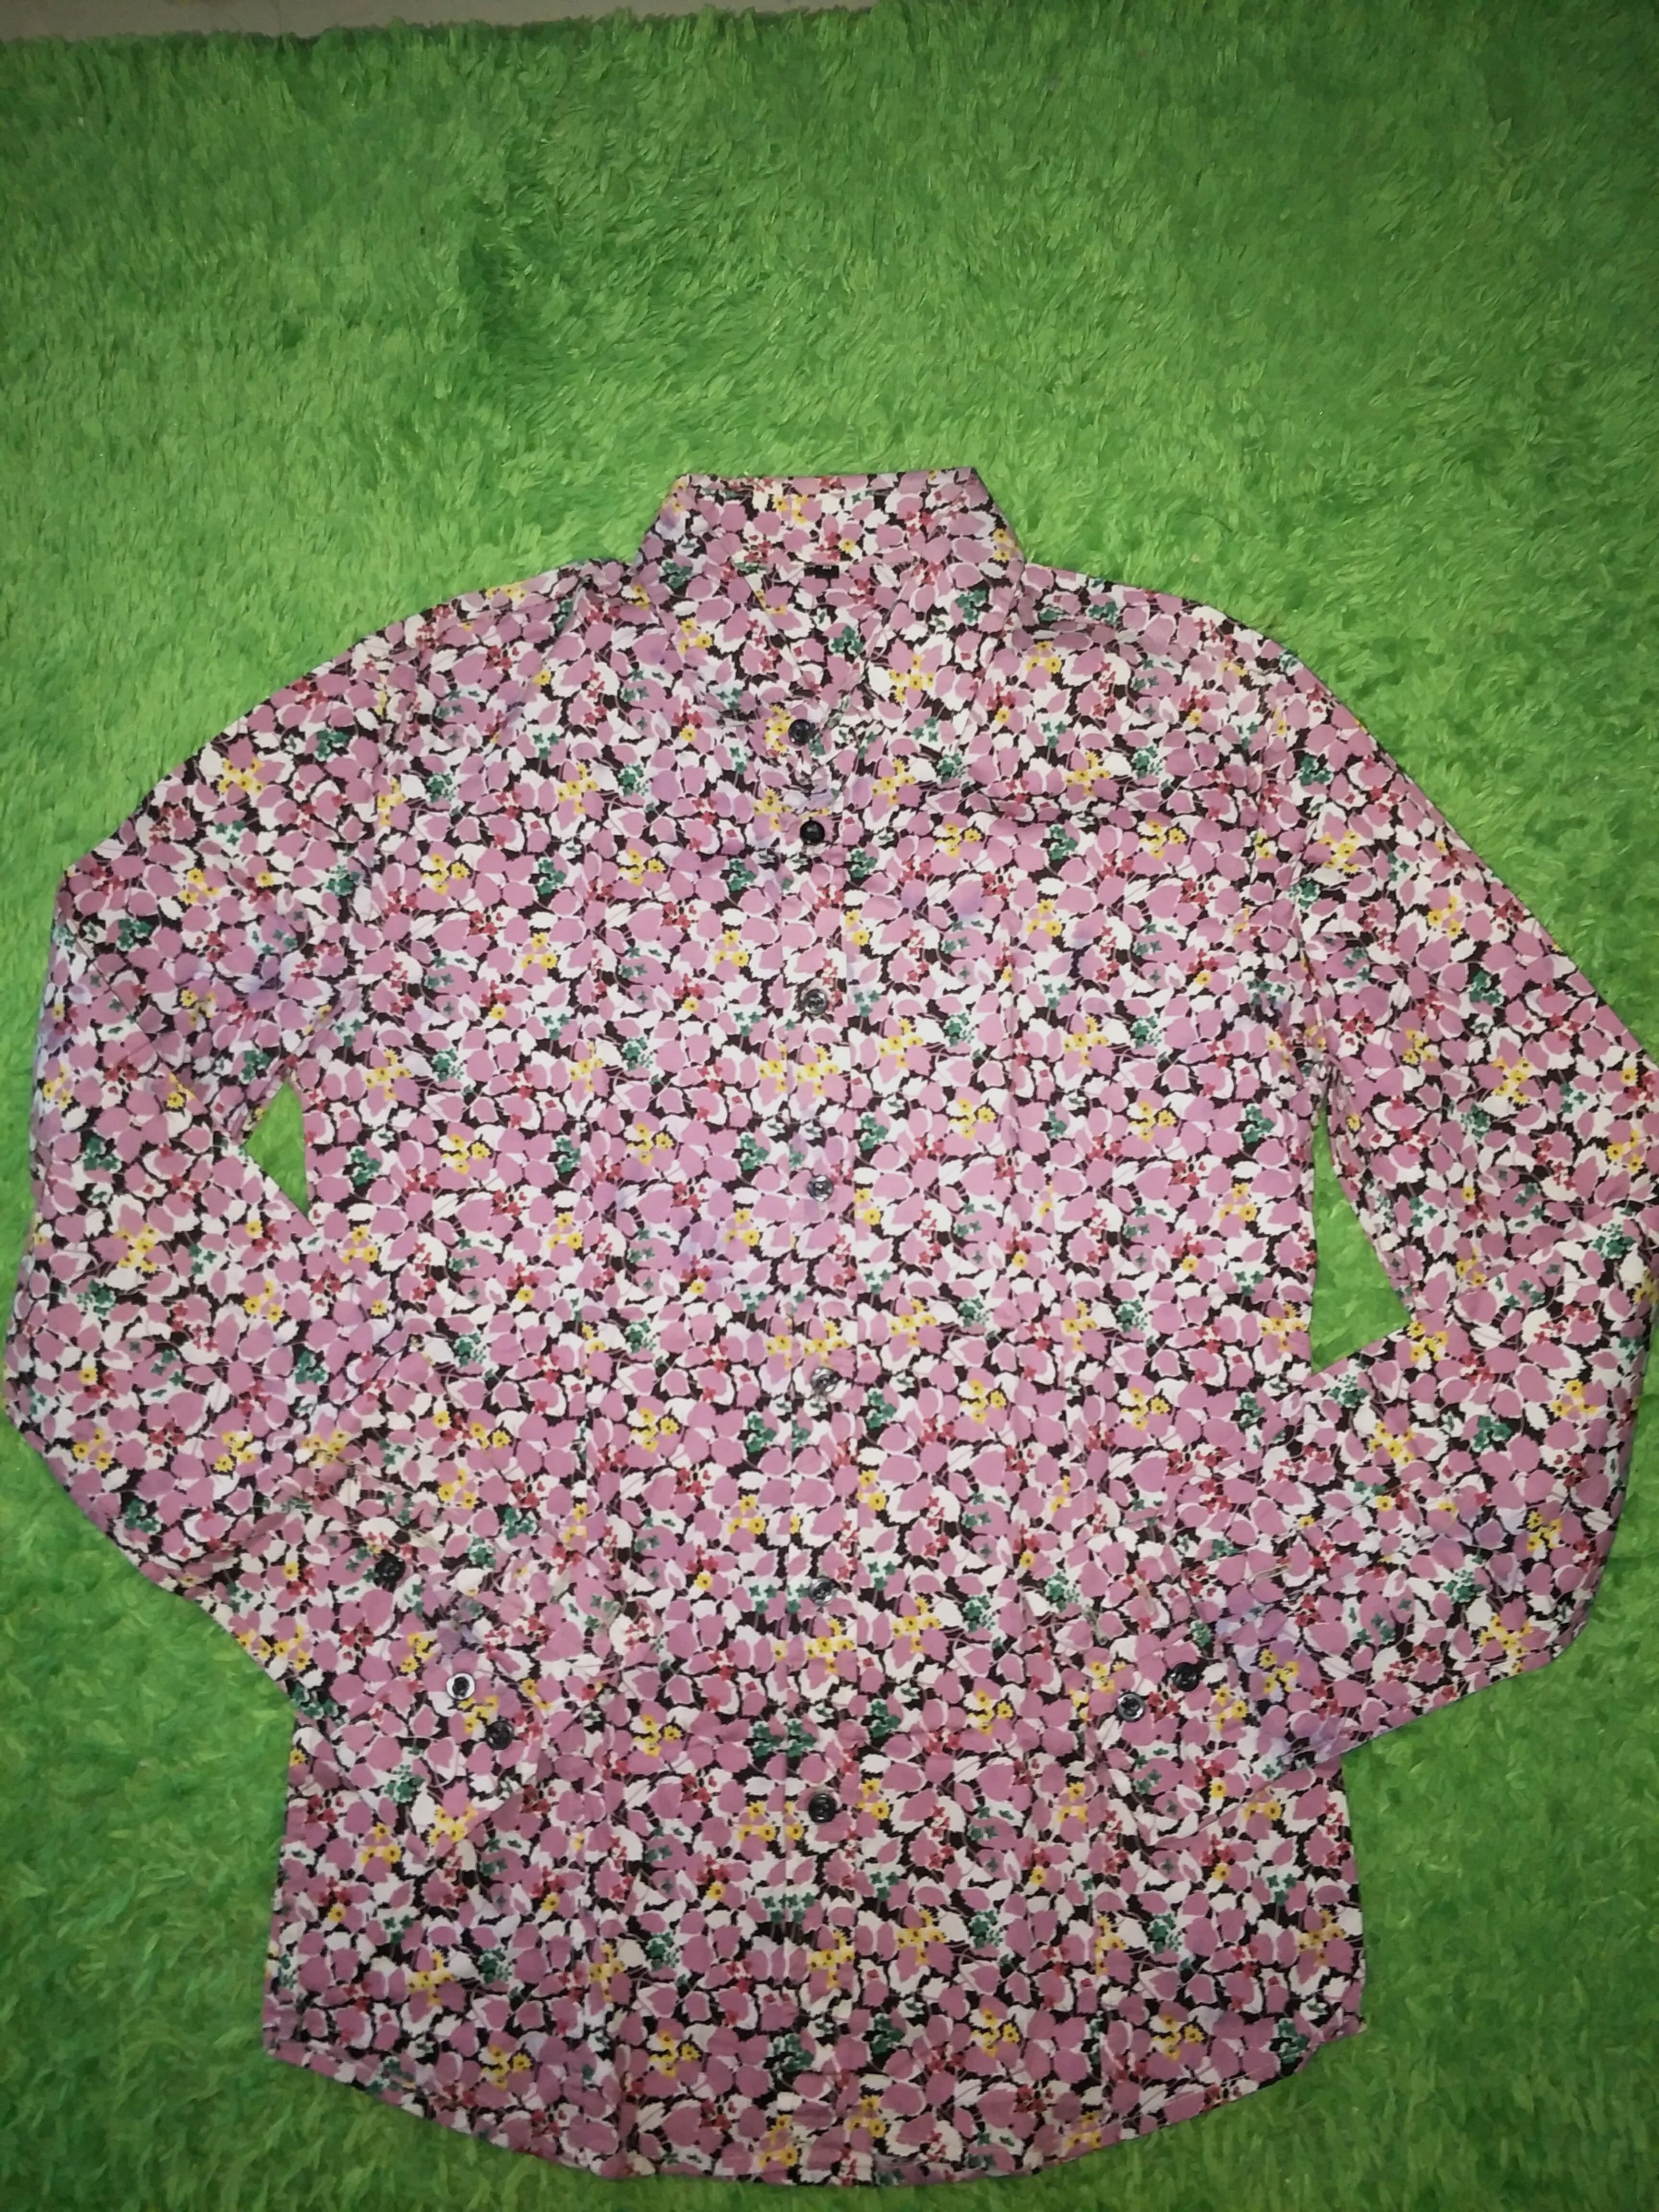 Kemeja floral kemeja bunga pria